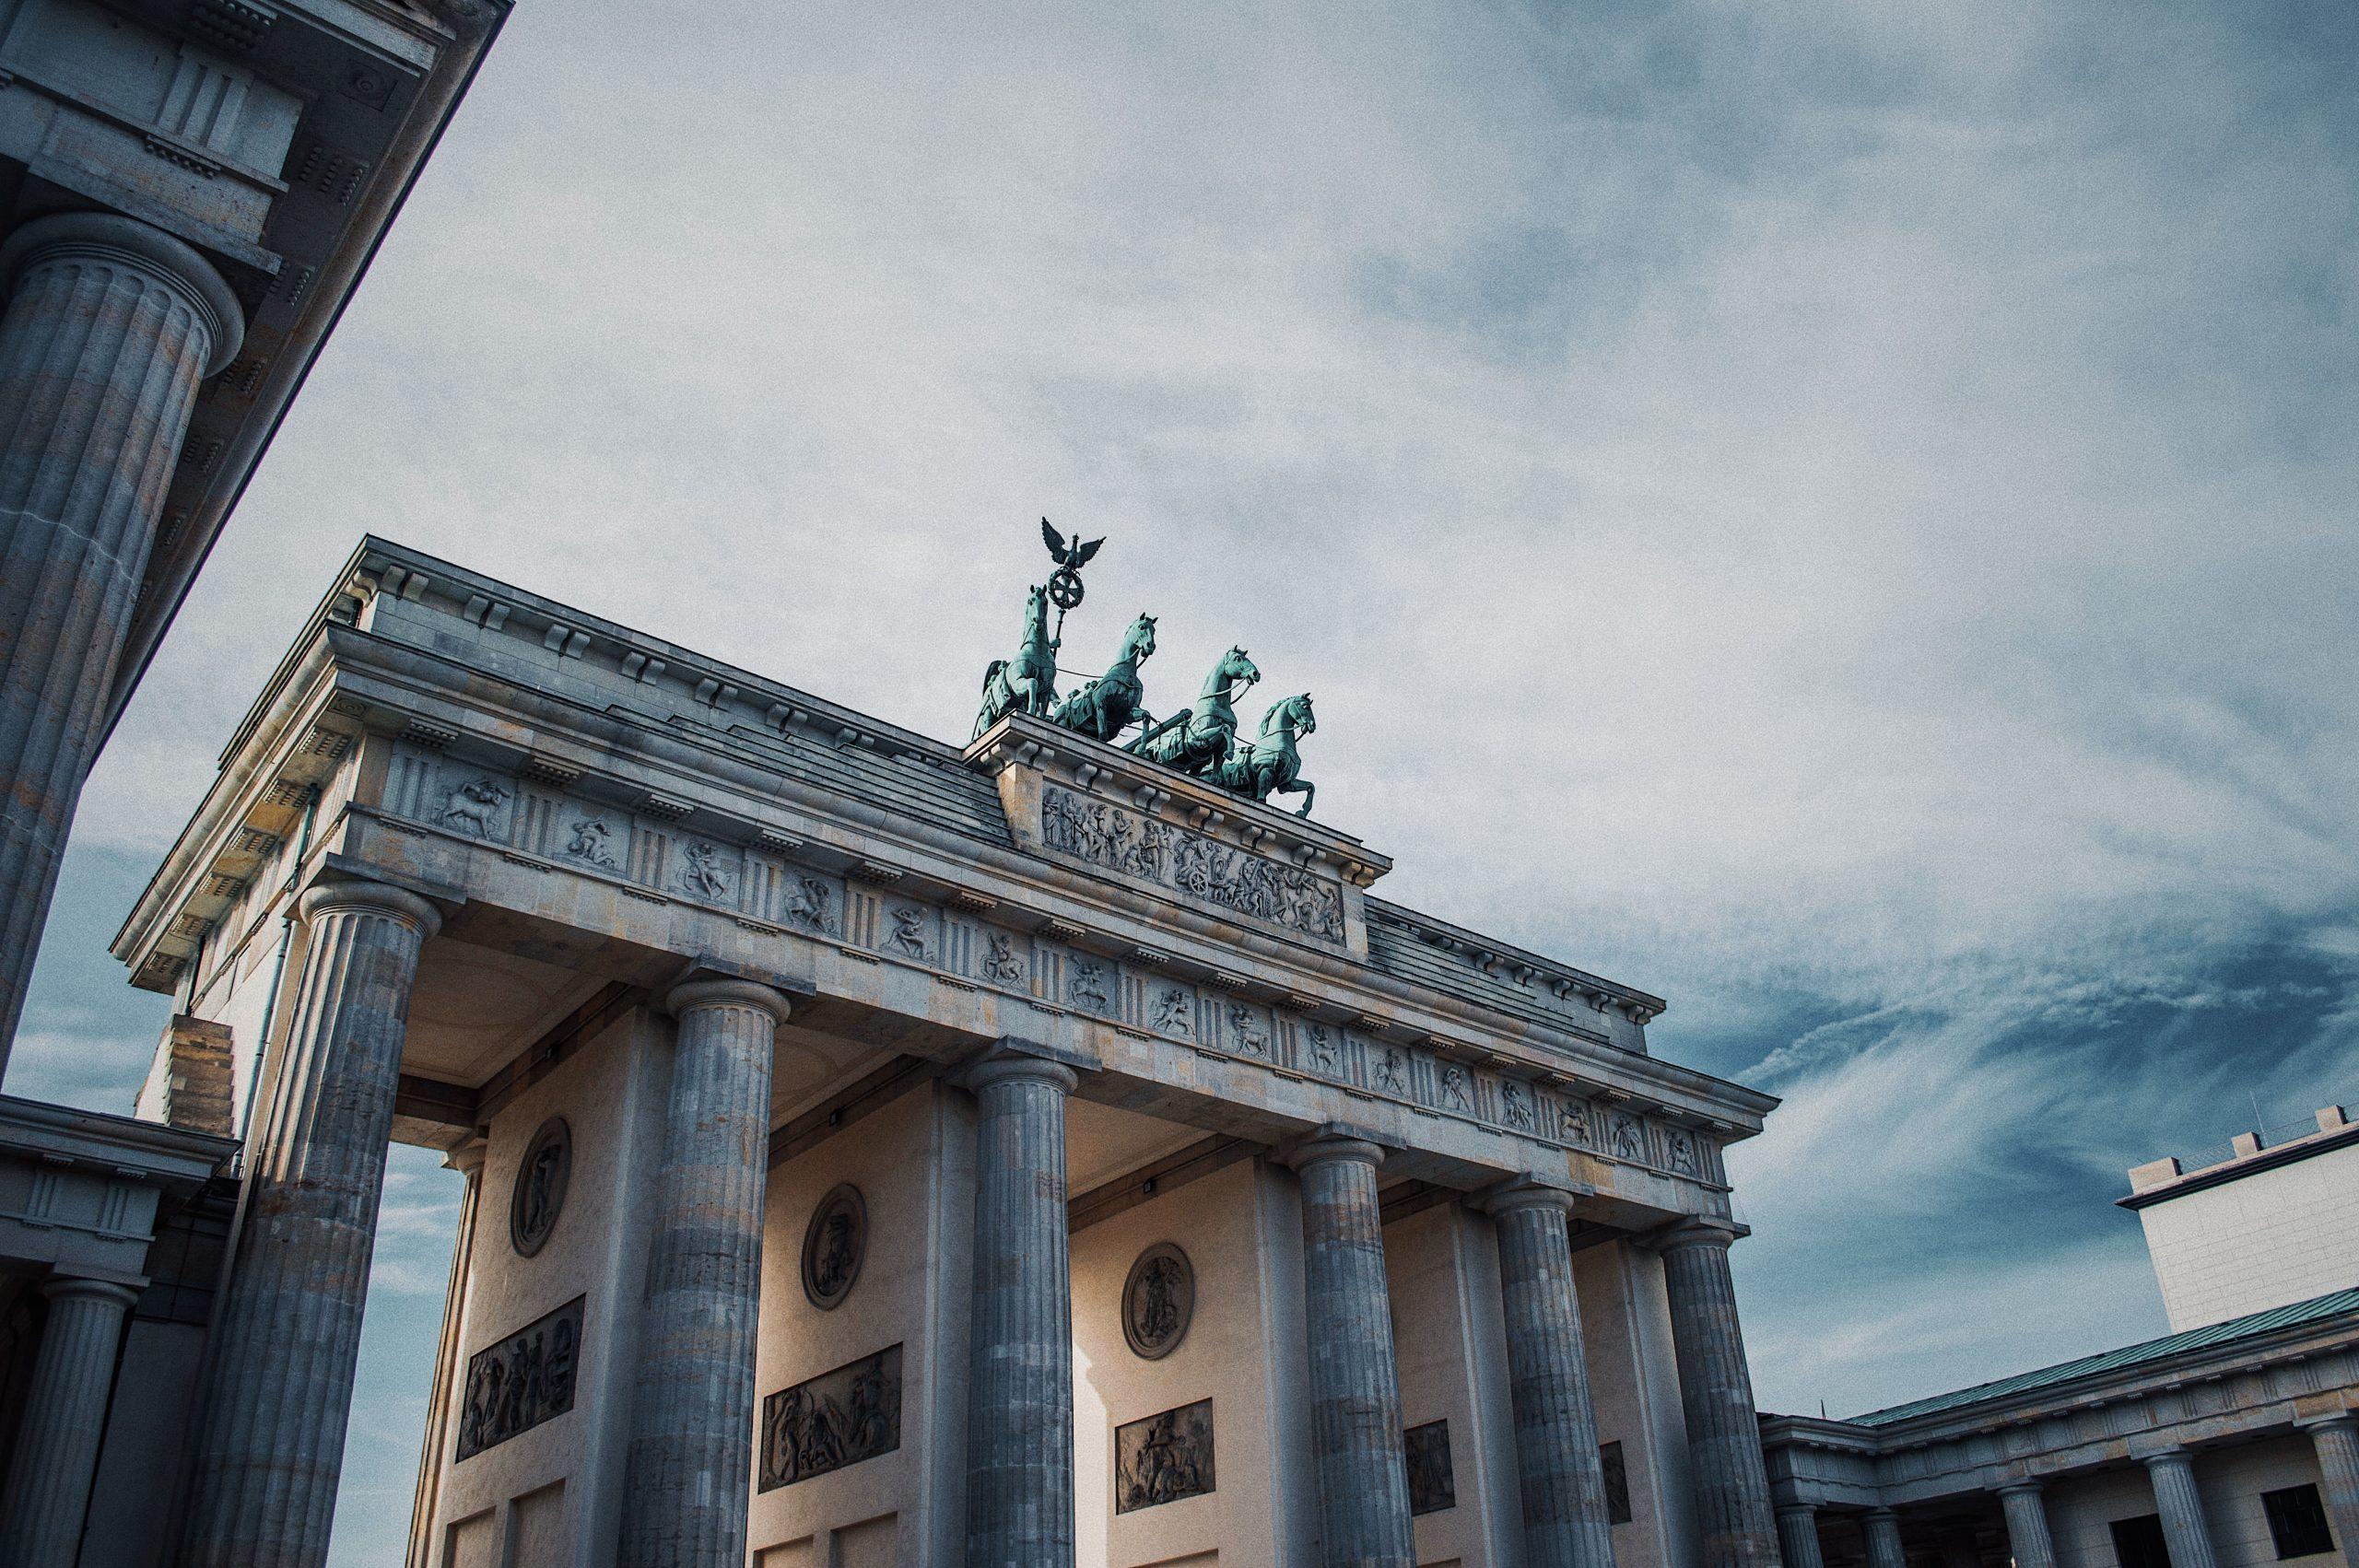 Pariser Platz in Berlin, Germany